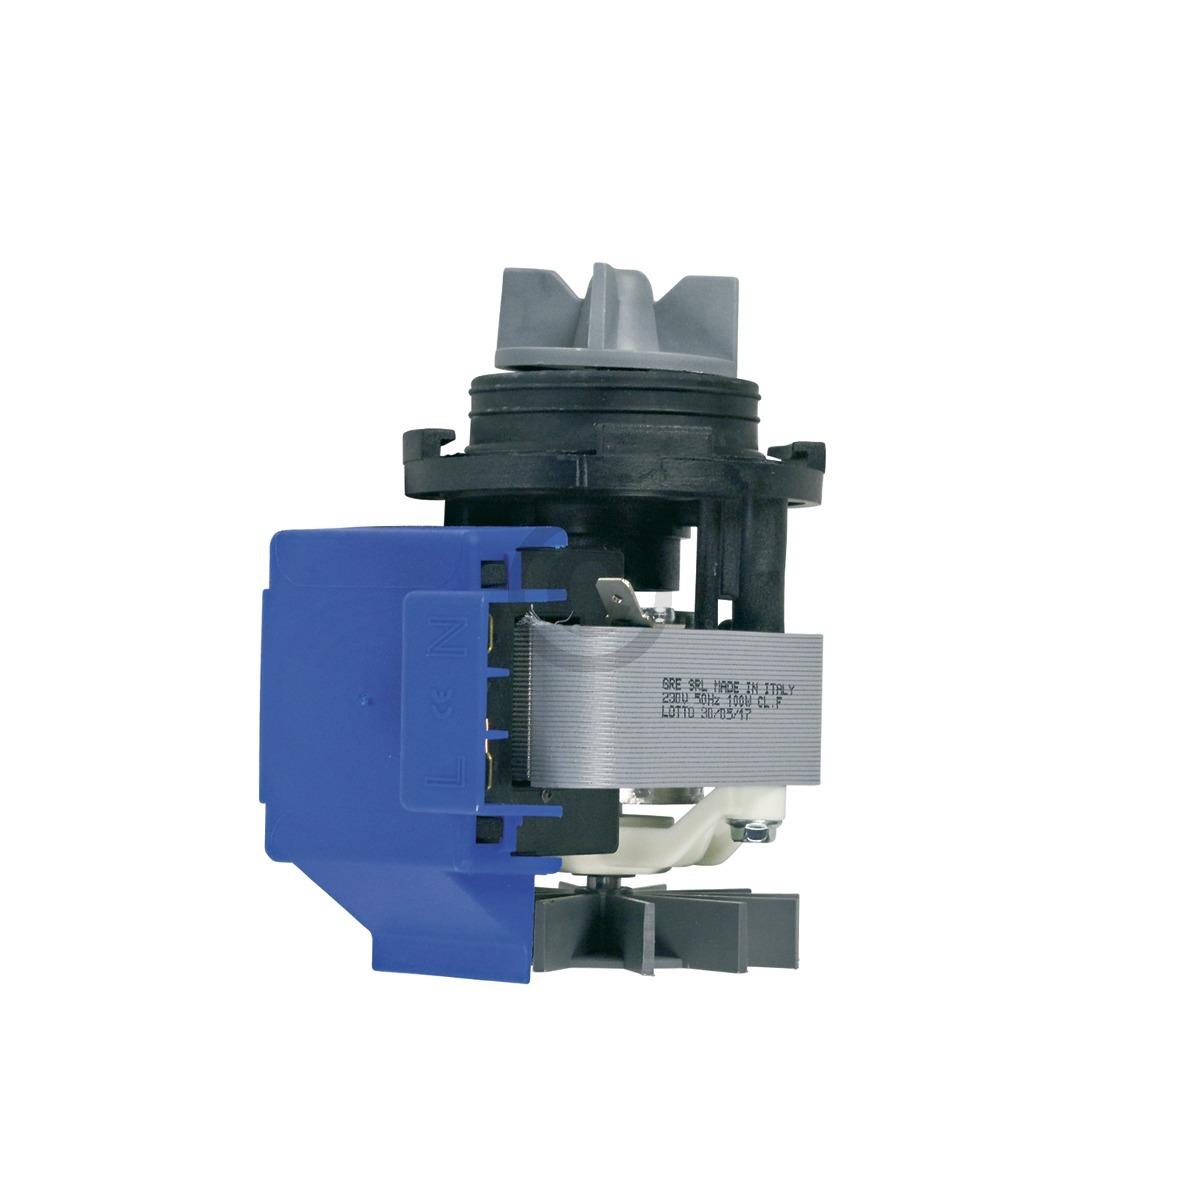 Ablaufpumpe Pumpenmotor Bajonettbefestigung Miele 7640961 Alternative Miele